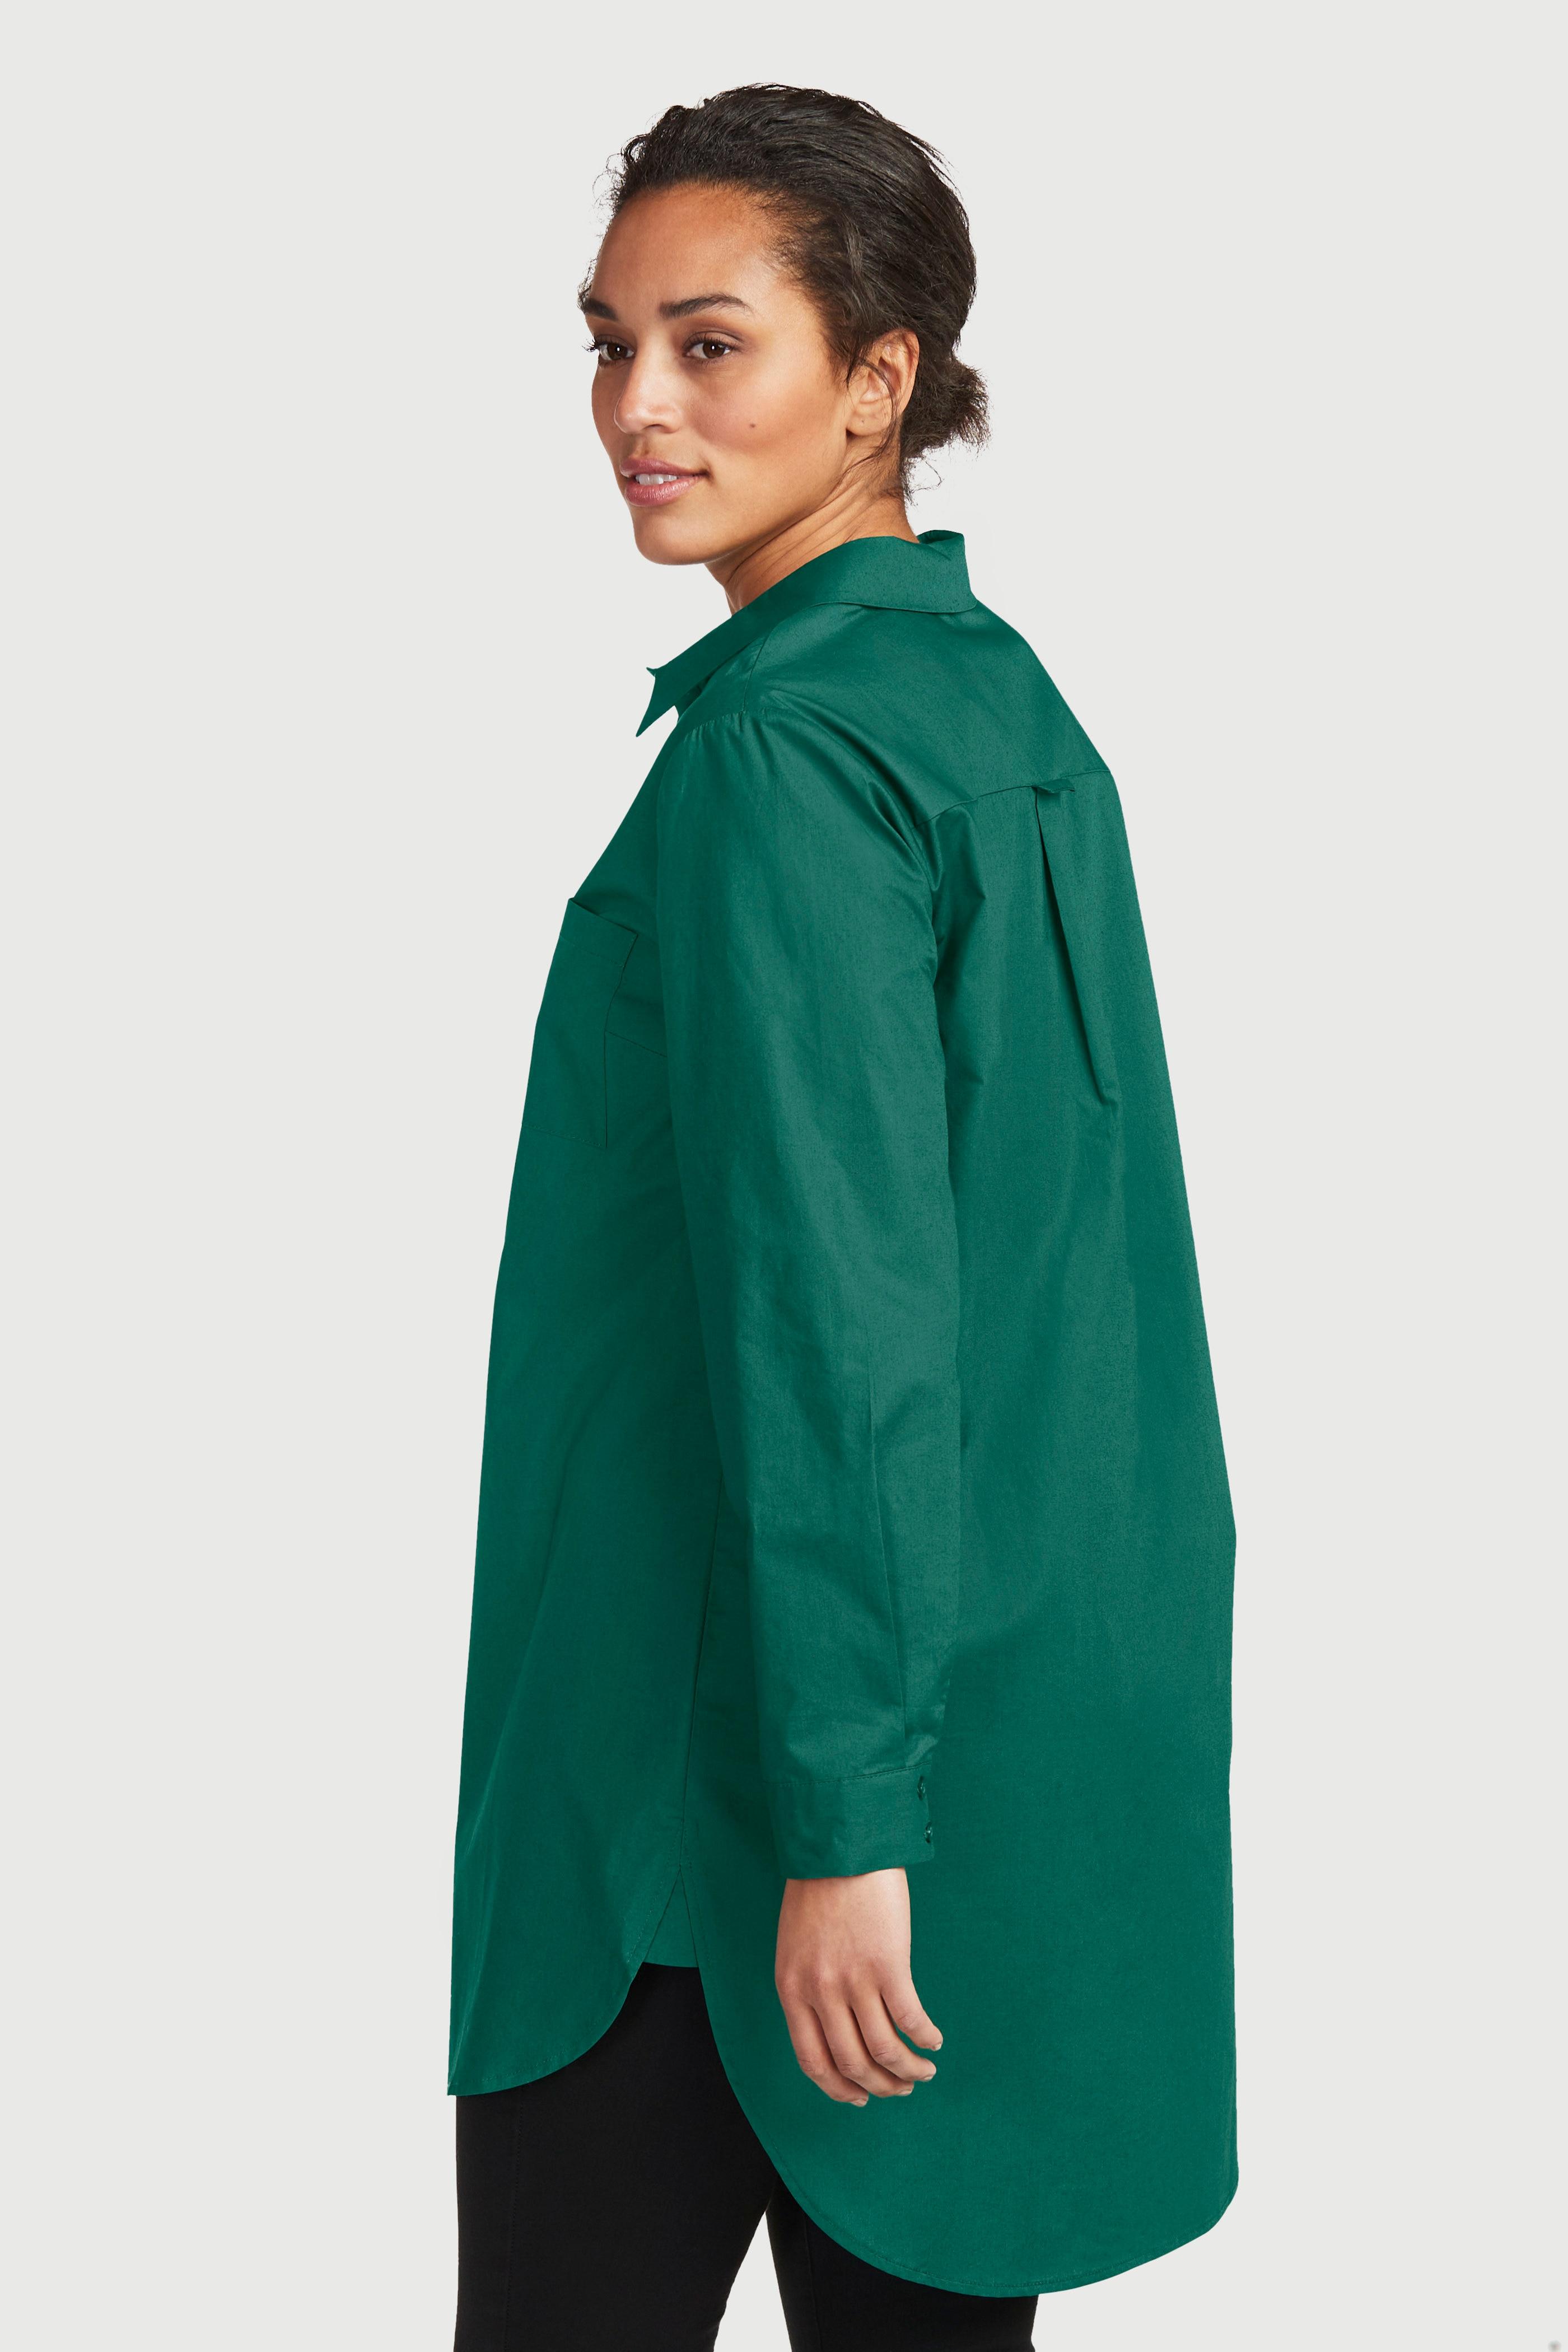 Långskjorta i ekologisk bomull